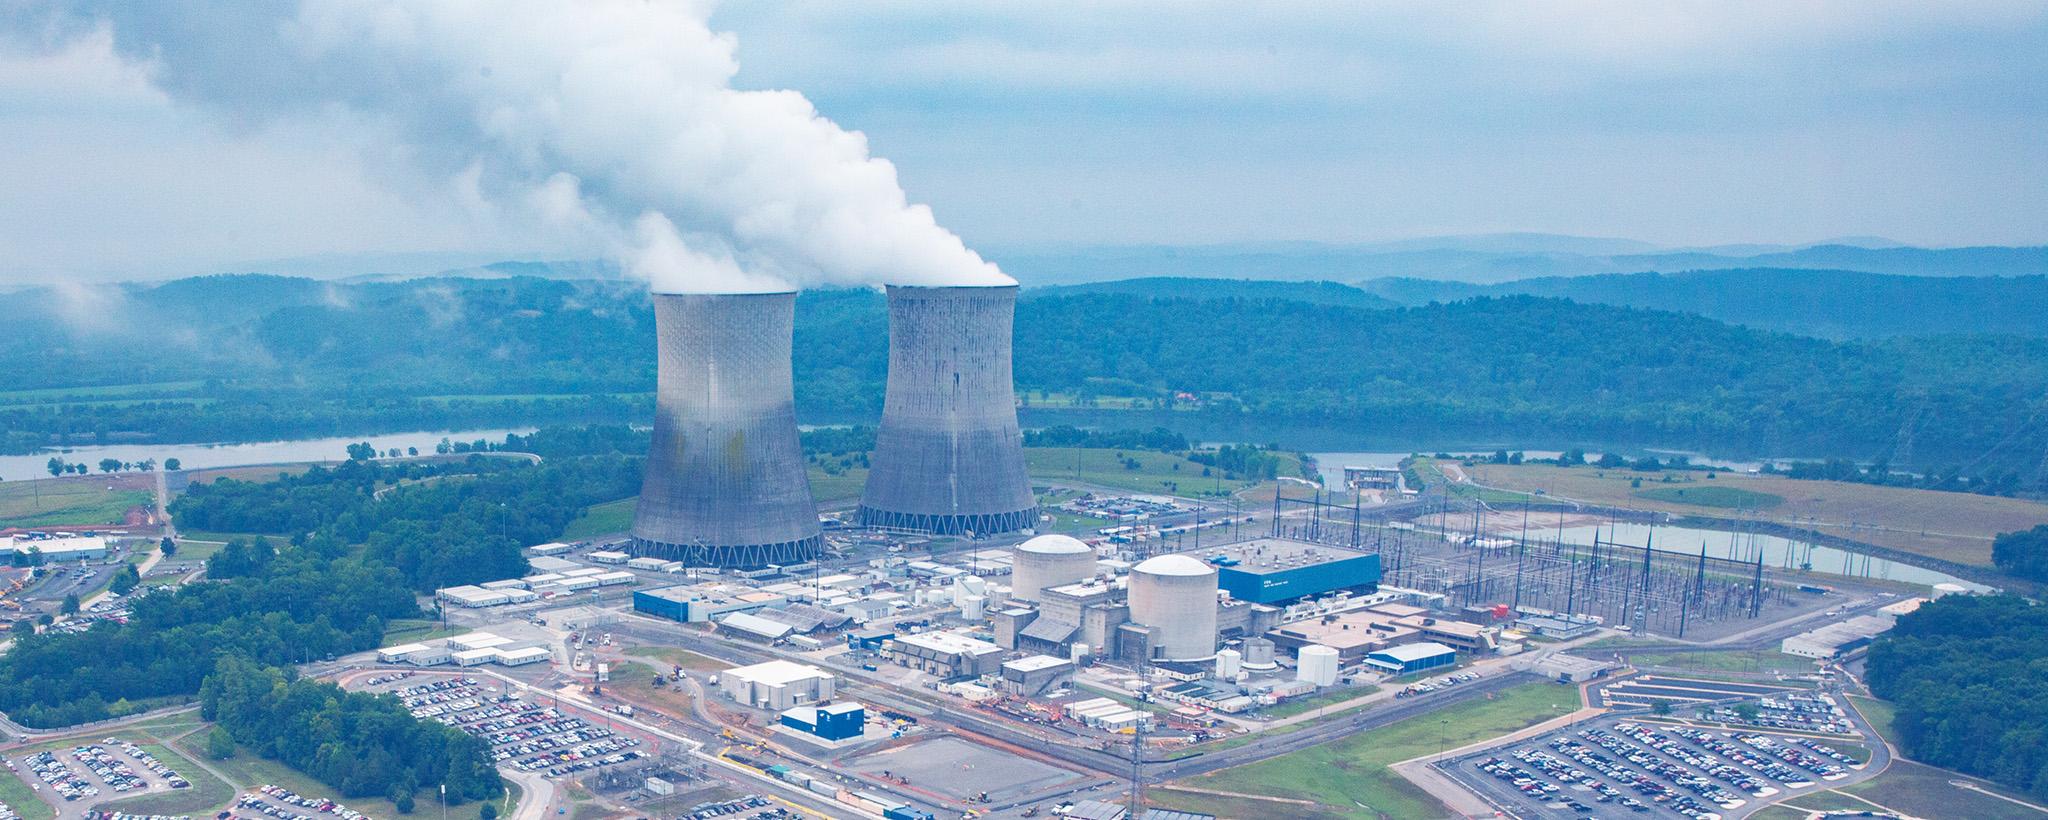 Watts Bar Nuclear Plant